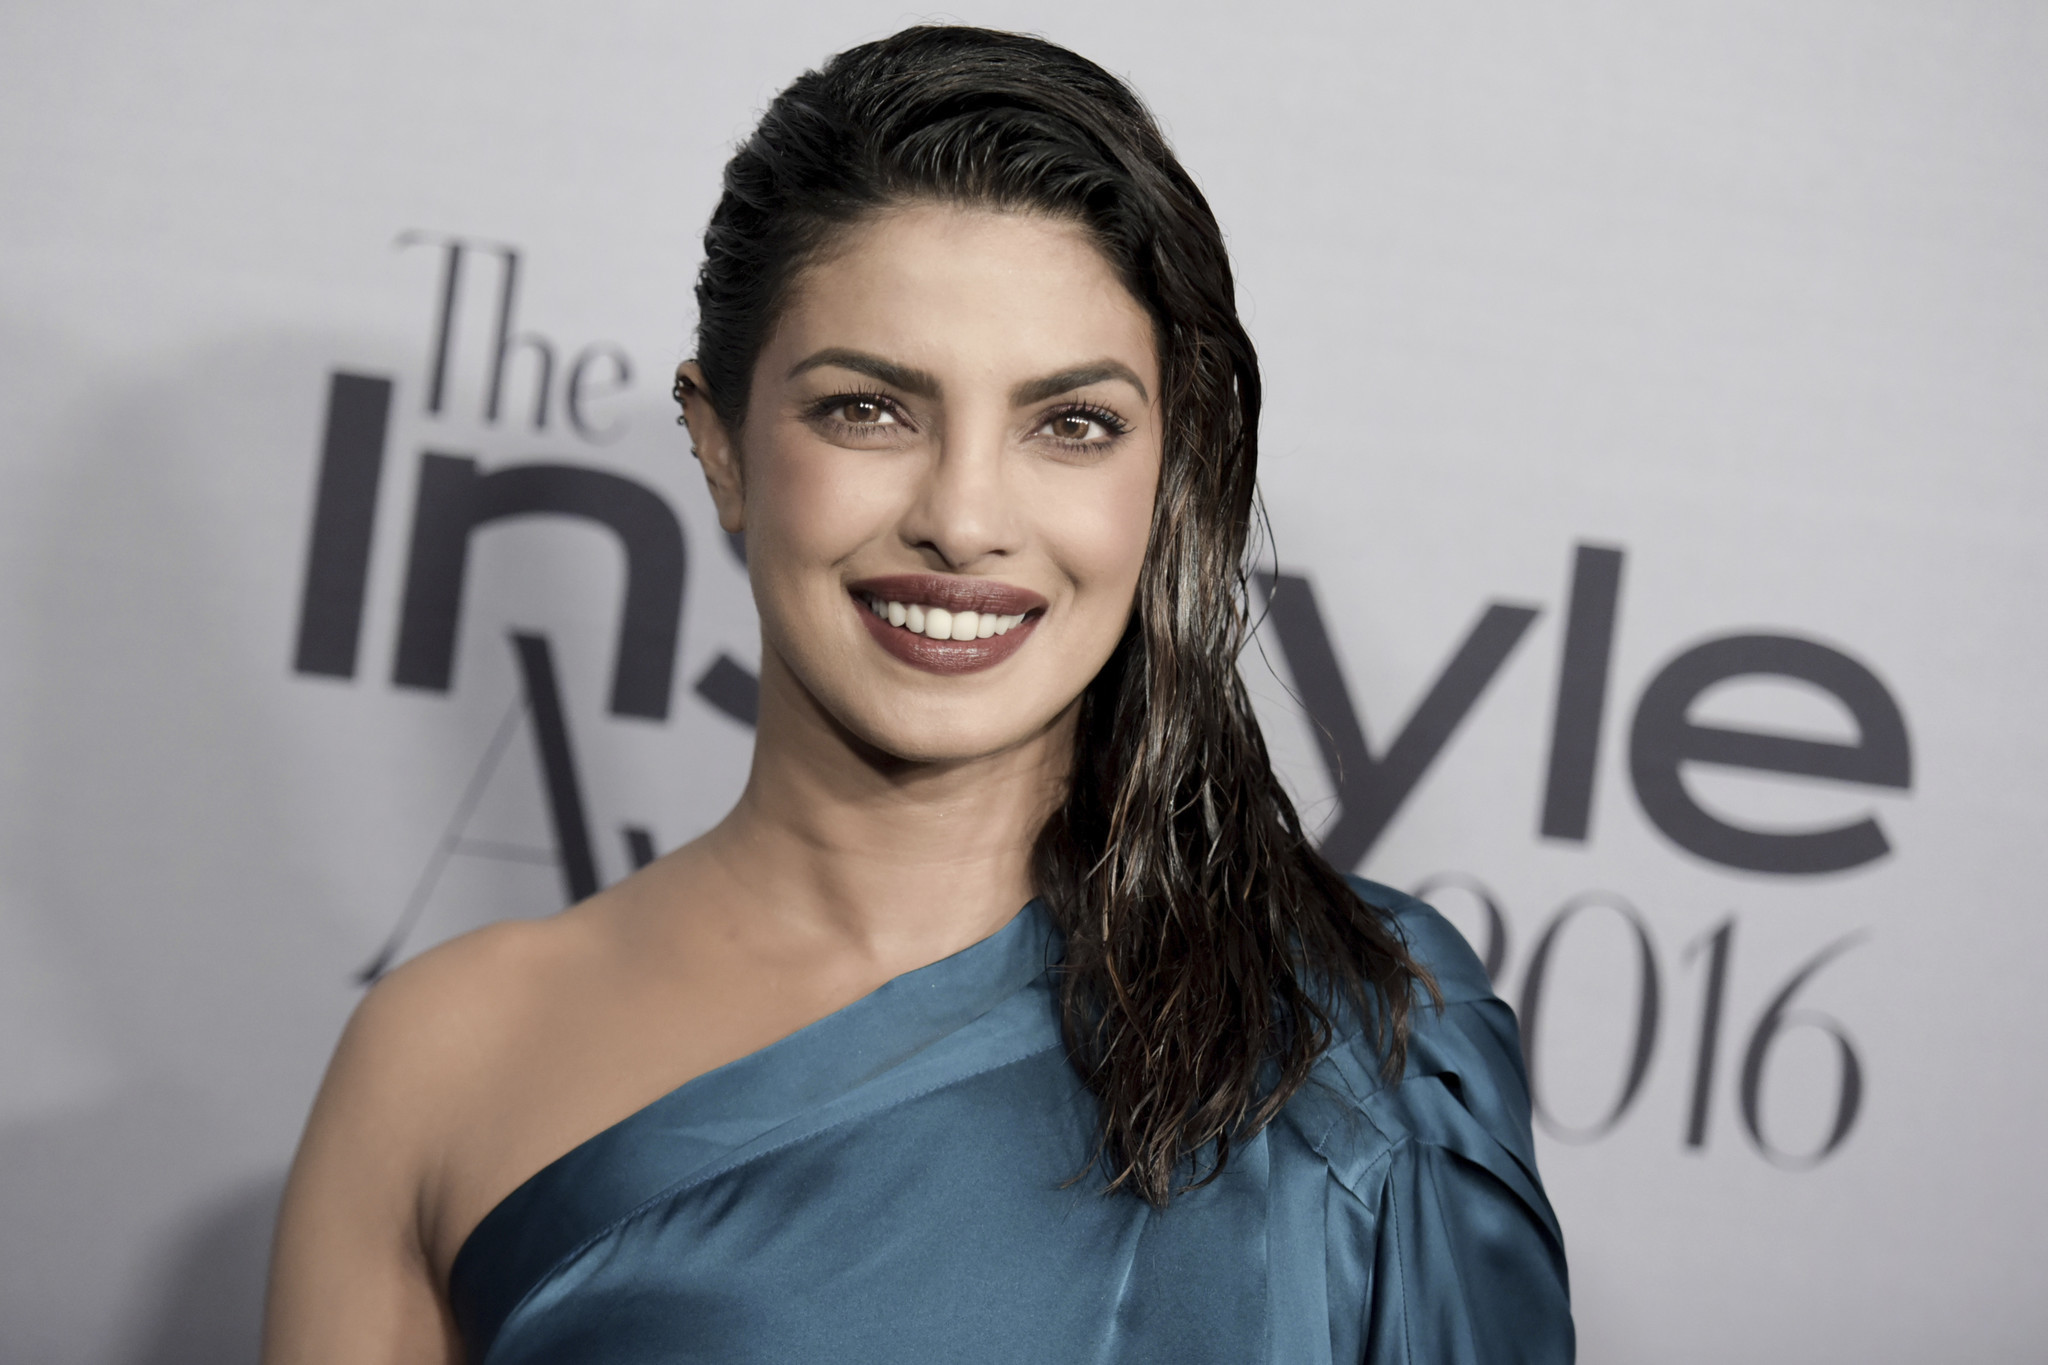 quantico' star priyanka chopra 'resting' after on-set injury